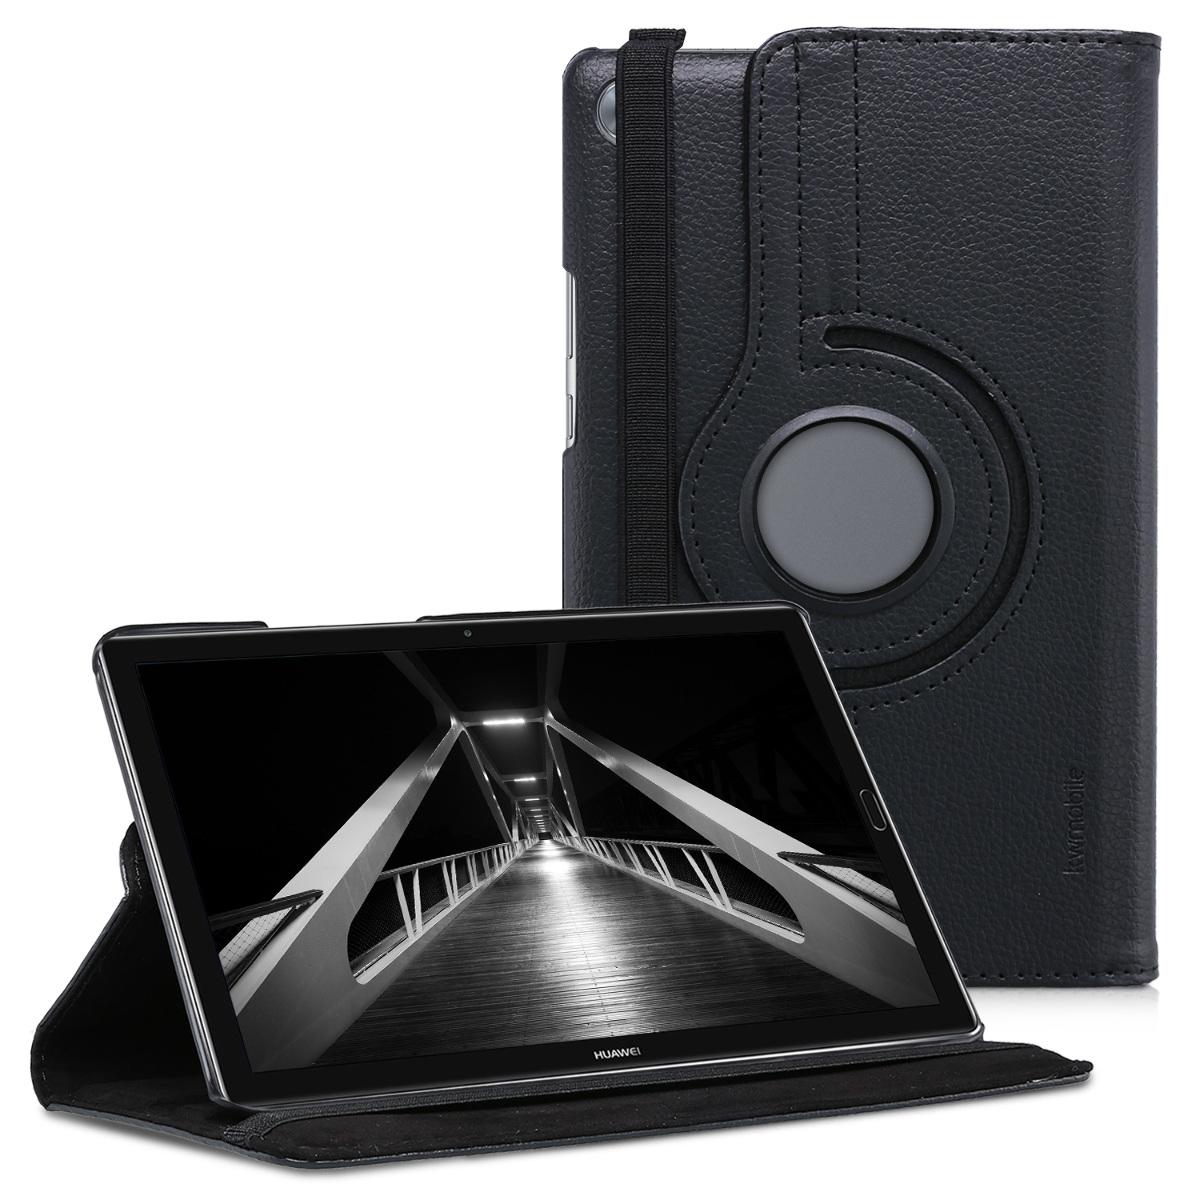 KW Θήκη 360° Huawei MediaPad M5 8' - Συνθετικό Δέρμα - Black (44242.01)